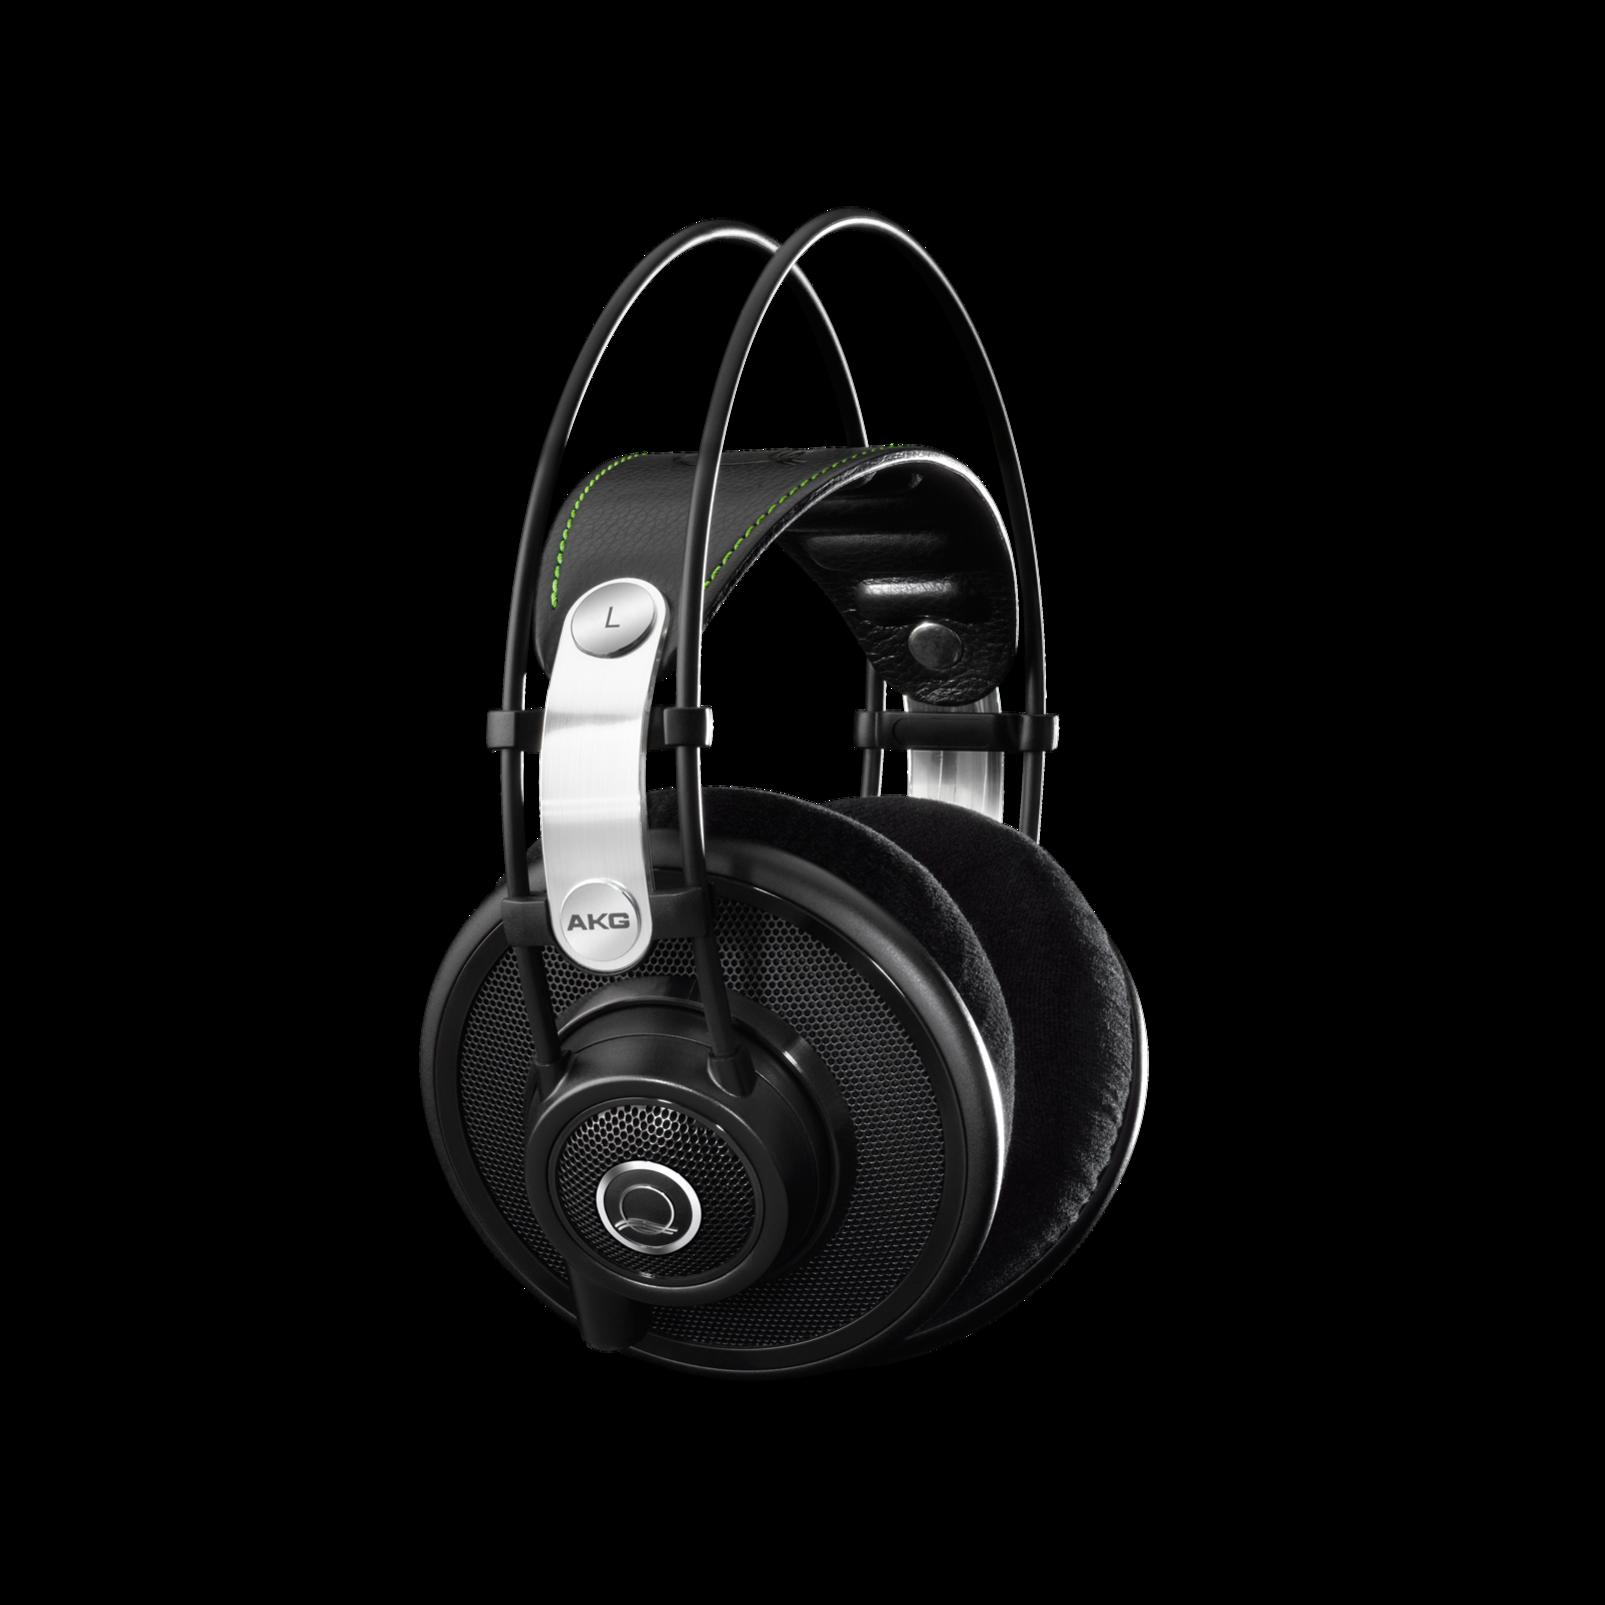 Q701 - Black - Quincy Jones Signature line, Reference-Class Premium Headphones - Detailshot 1